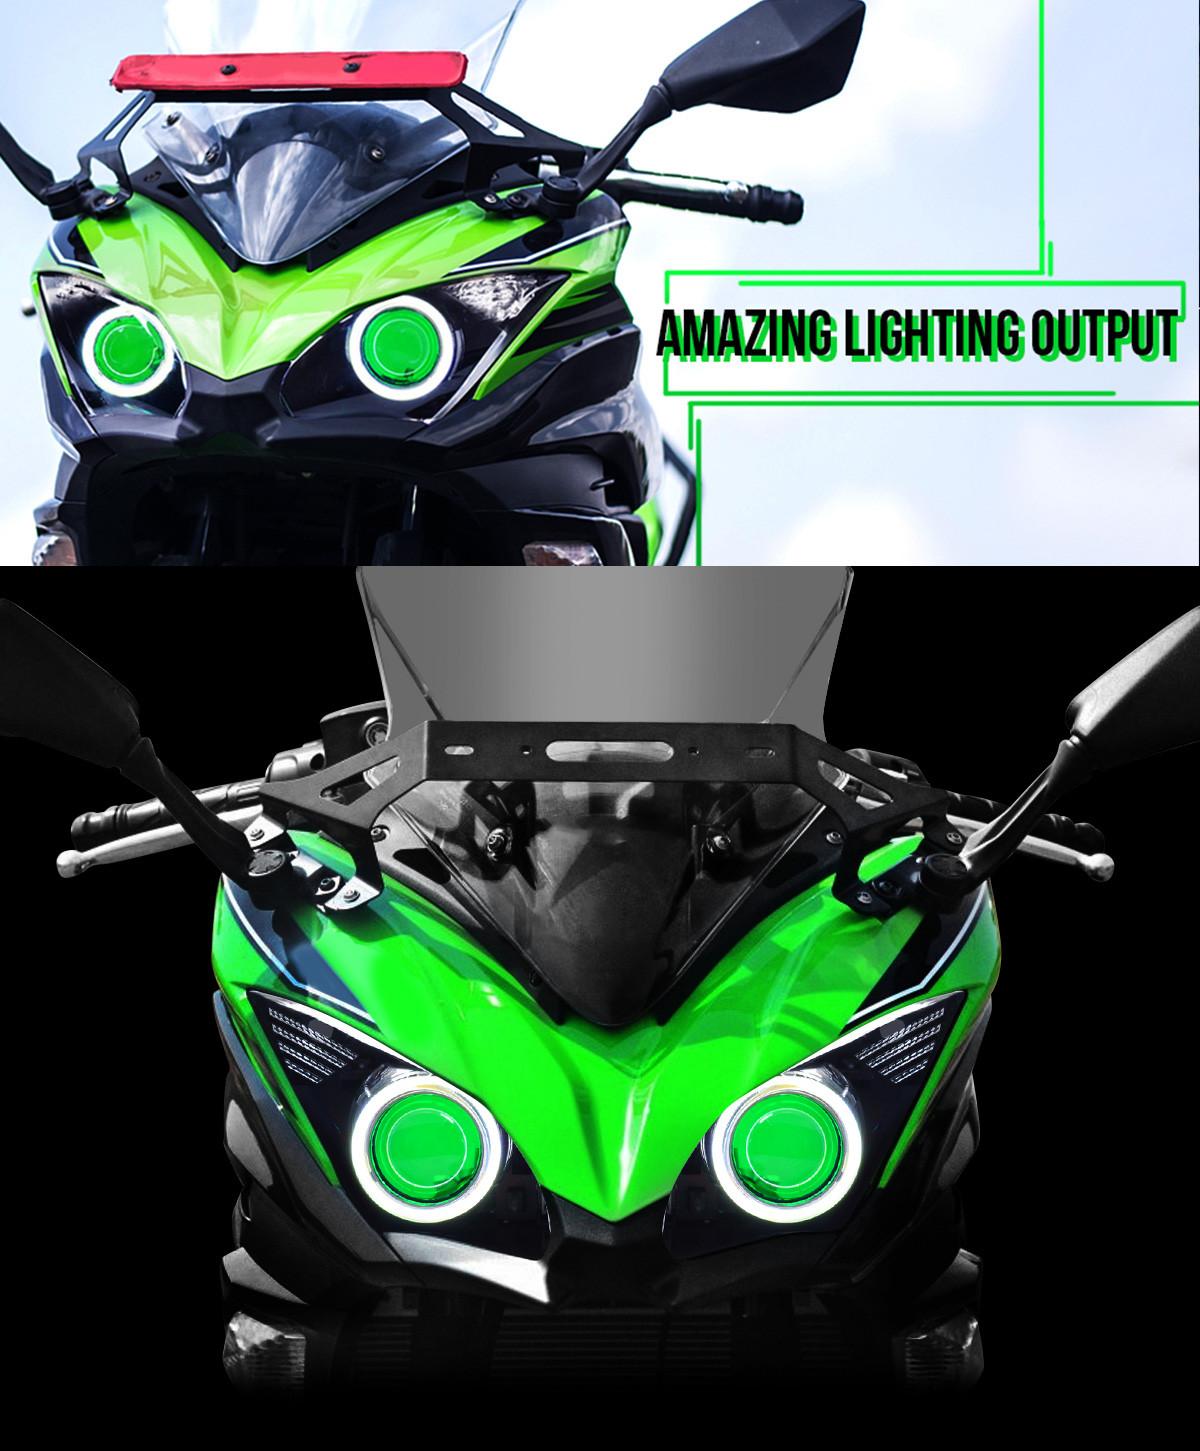 2017+ kawasaki Ninja650 headlight